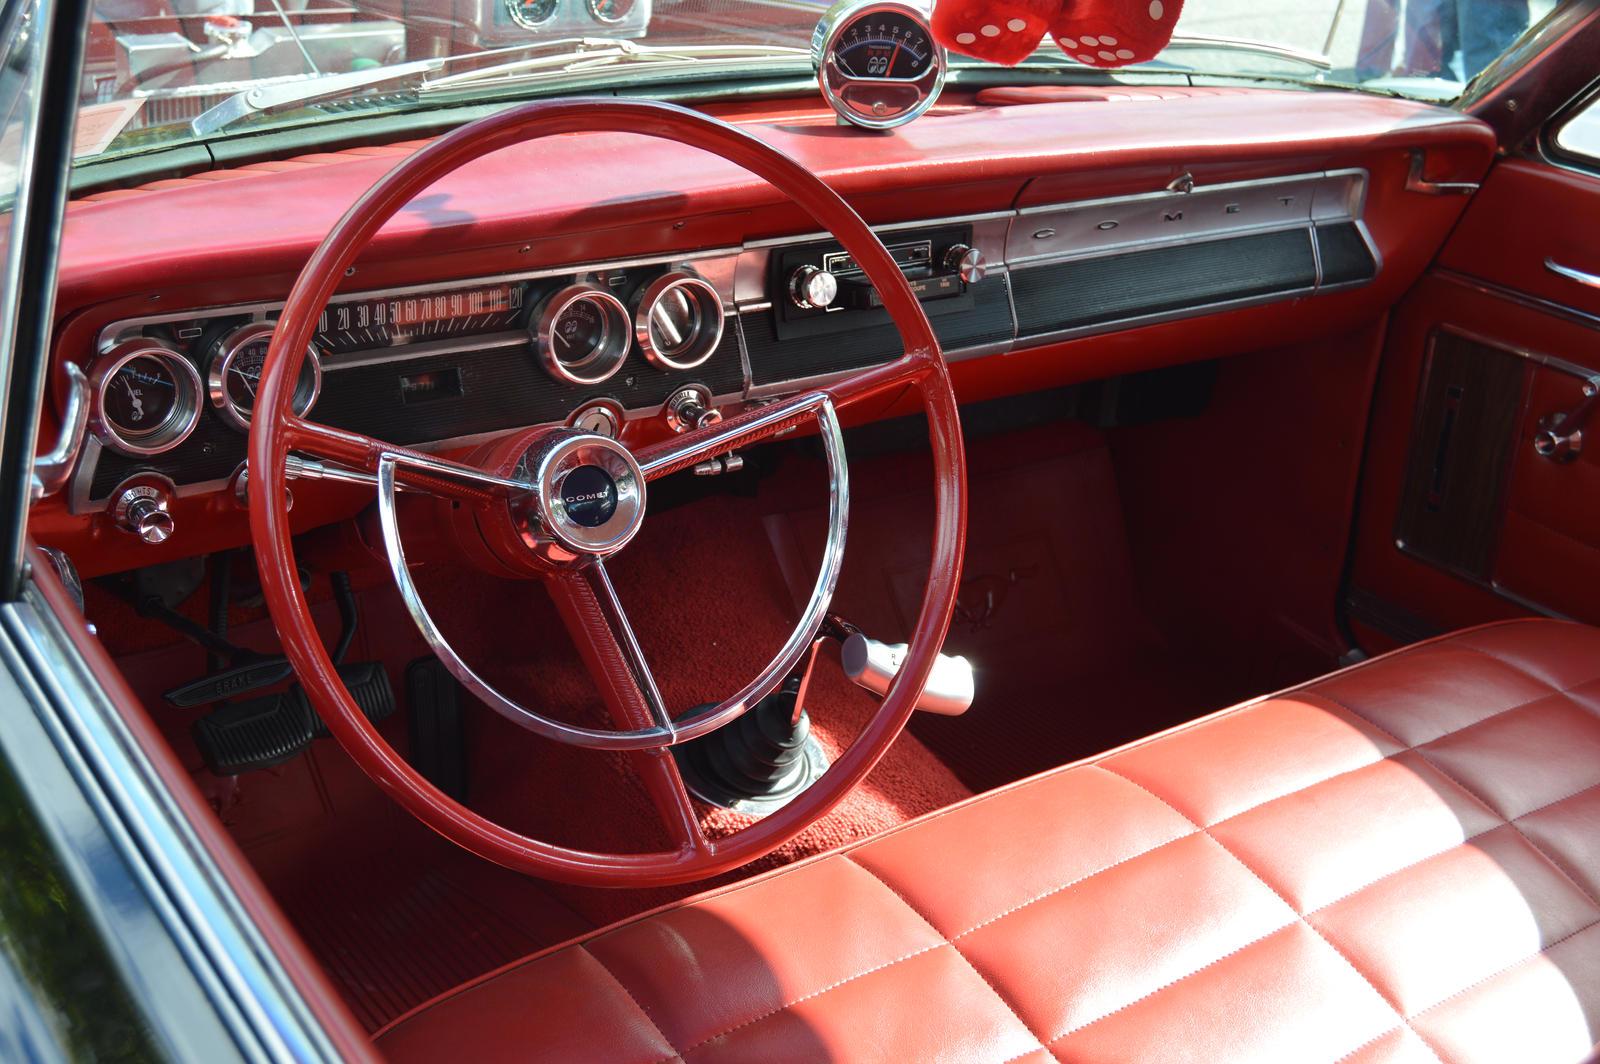 1964 Mercury Comet Interior by Brooklyn47 on DeviantArt  1964 Mercury Co...